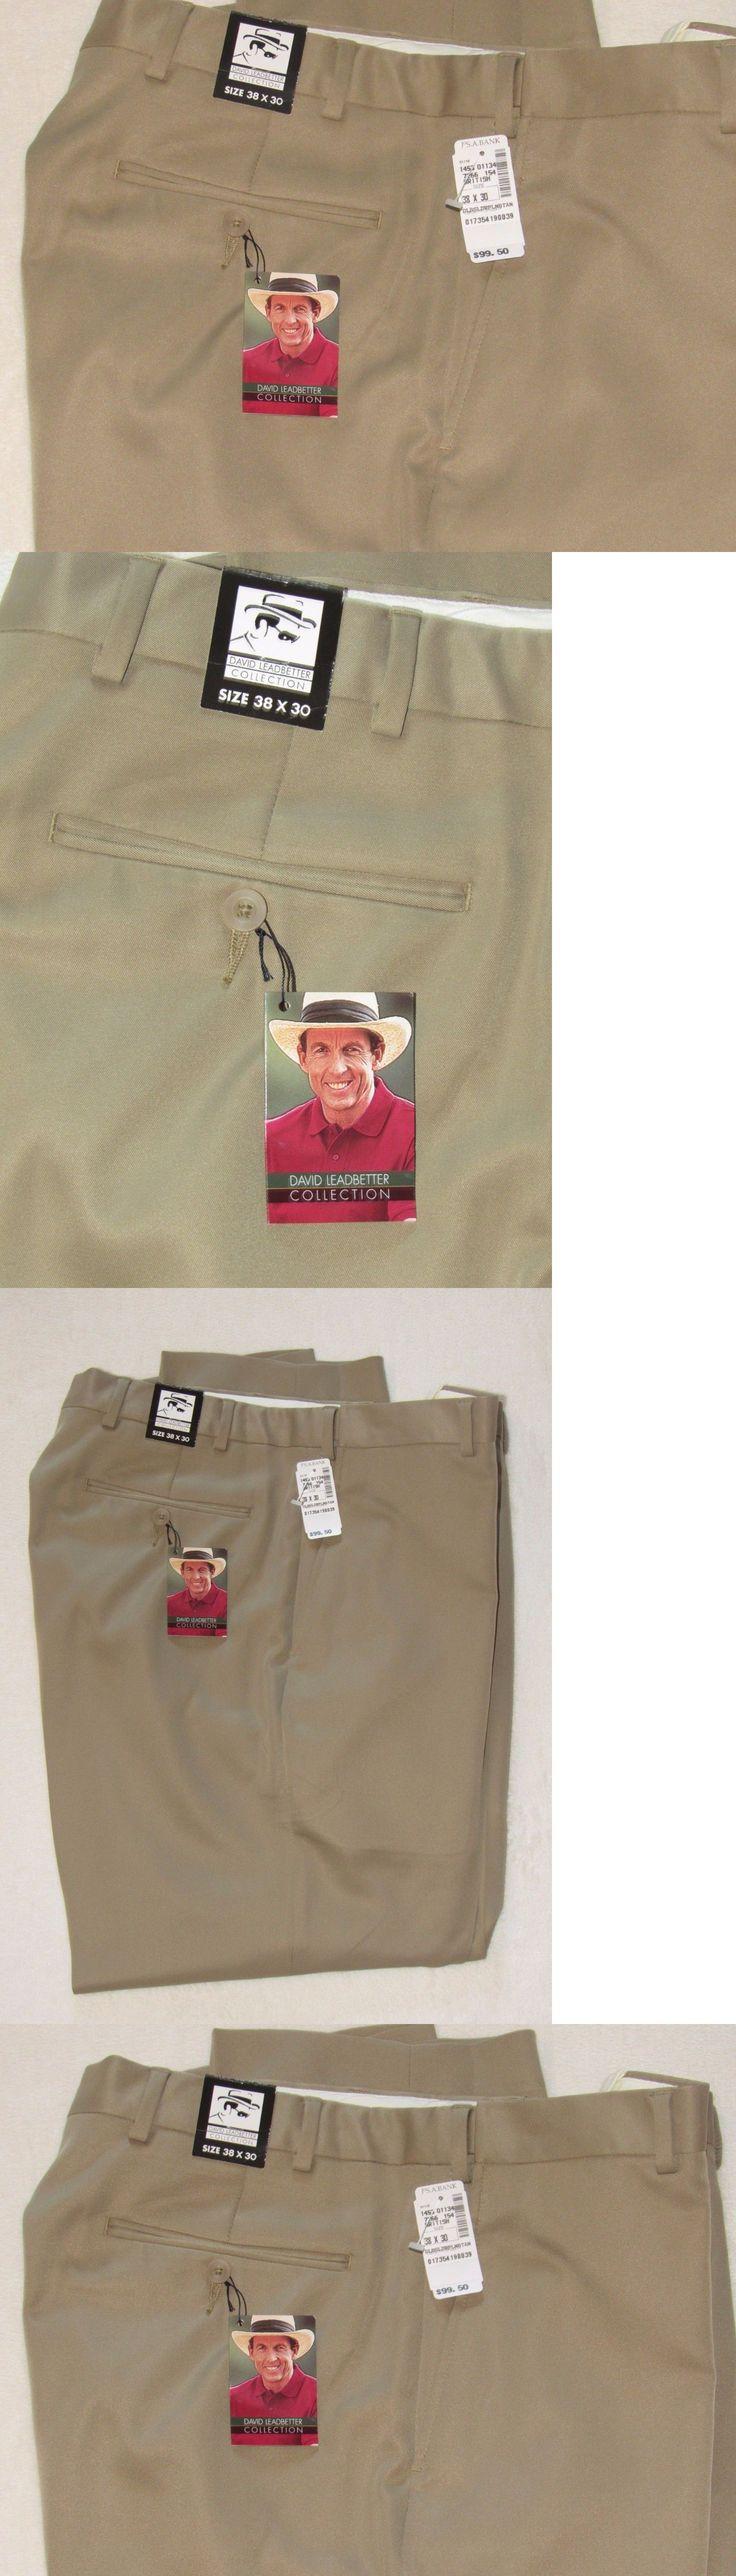 Pants 181137: Jos.A.Banks David Leadbetter Men S 38X30 Khaki Tan Golf Slacks Pants Nwt -> BUY IT NOW ONLY: $37.95 on eBay!